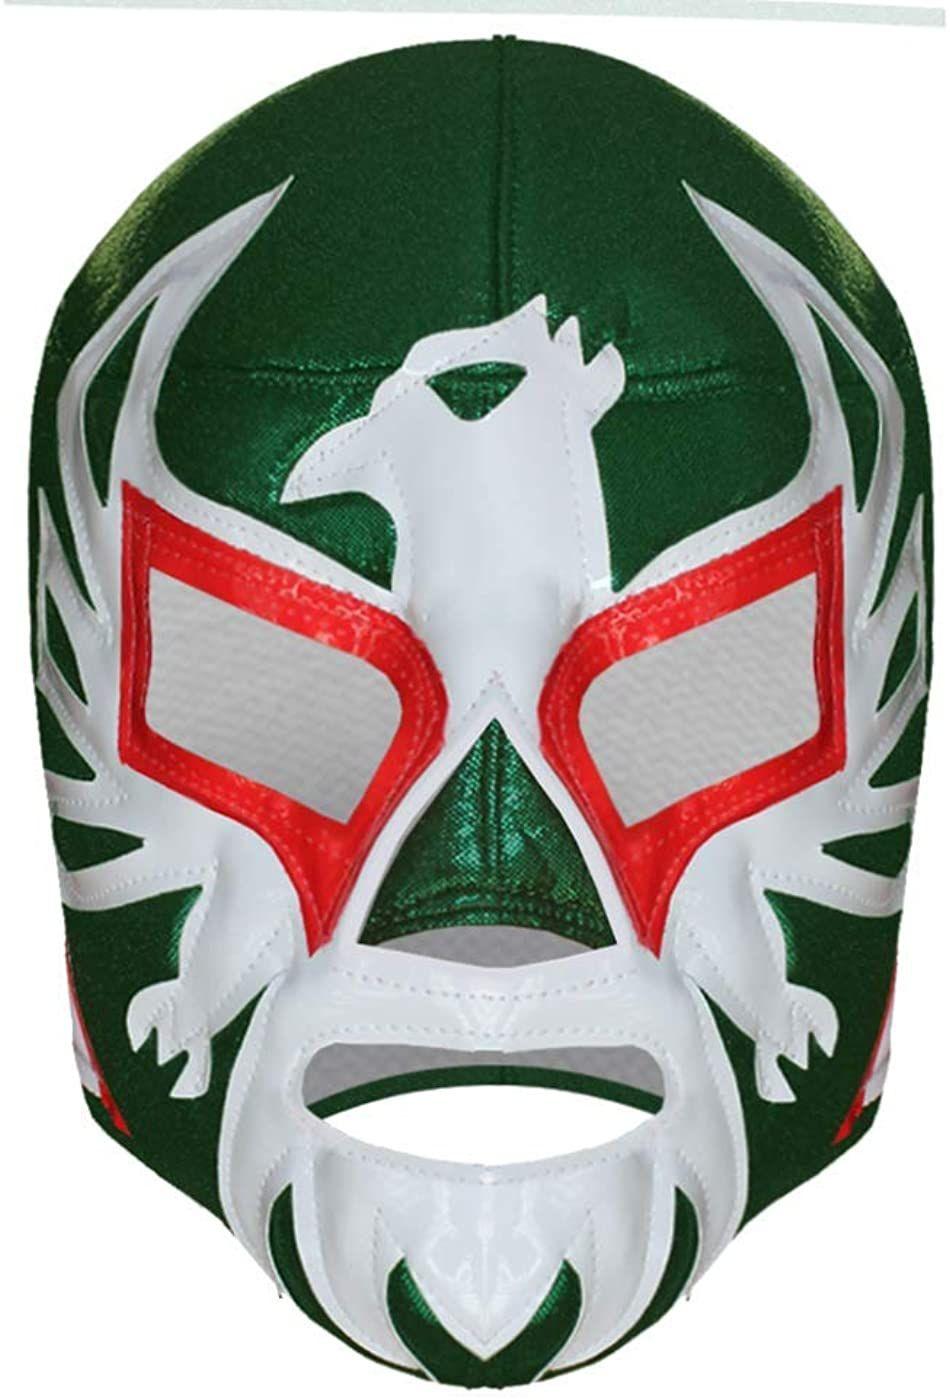 #LuchadorMaskAdult #luchalibreMask #luchadorKidMask#WrestlingMaskForMen #WretslerMask #WrestlerGift #WrestlingMan #LuchaLibreMexicana #LuchadoresMexicanos #LuchaLibreMexicanaMascaras #Wrestling #LuchaLibre #Lucha #MexicanCostume #MexicanParty #MexicanWrestling #ElMexicano  #CostumeElMexicano #MexicanMask  #MaskElMexicano ⬆️You can buy HERE  ⬆️